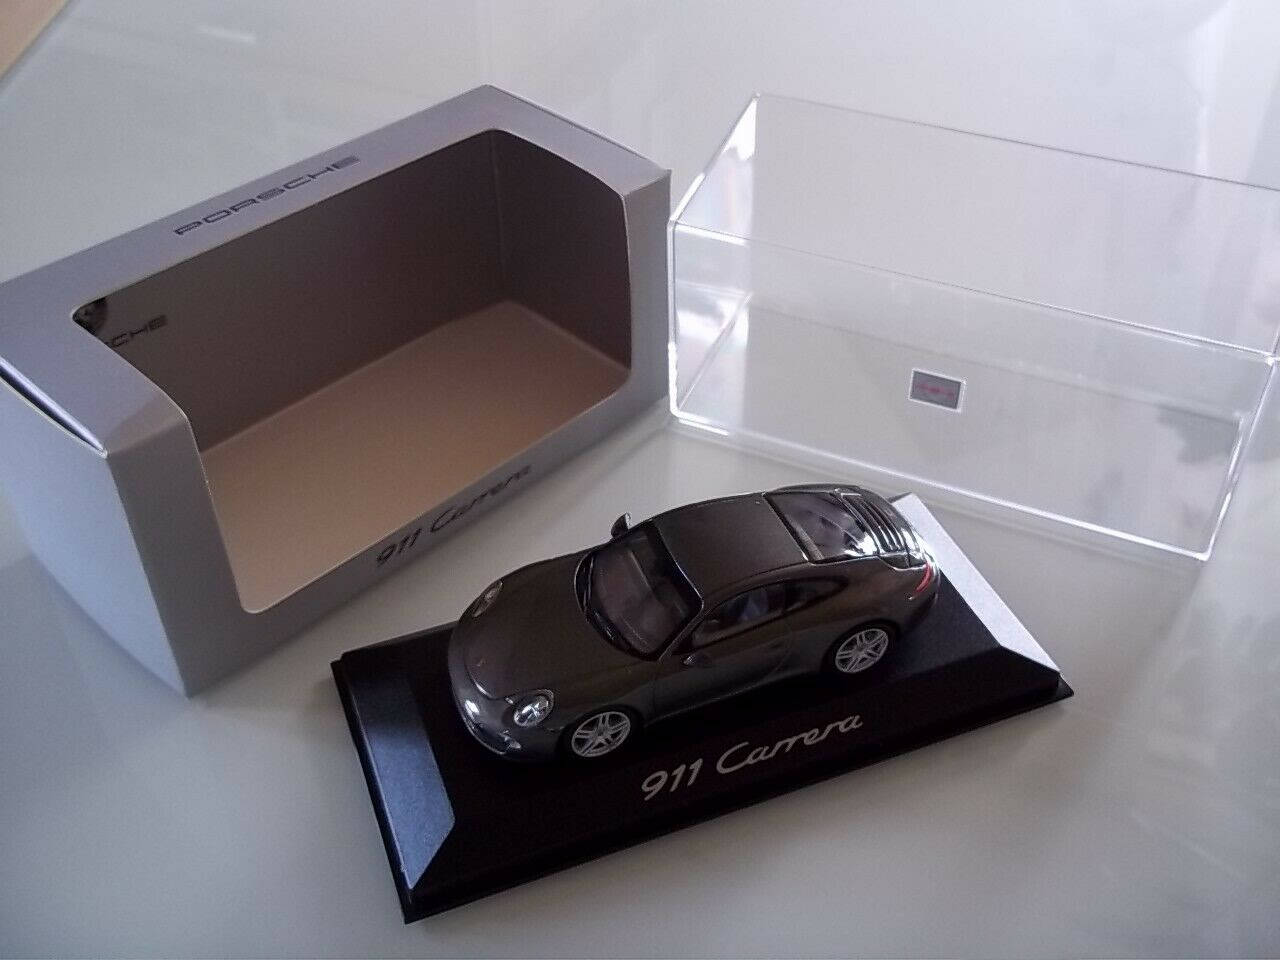 Original PORSCHE - PORSCHE 911 Carrera (991) - achatgrau metallic - 1 43 - OVP